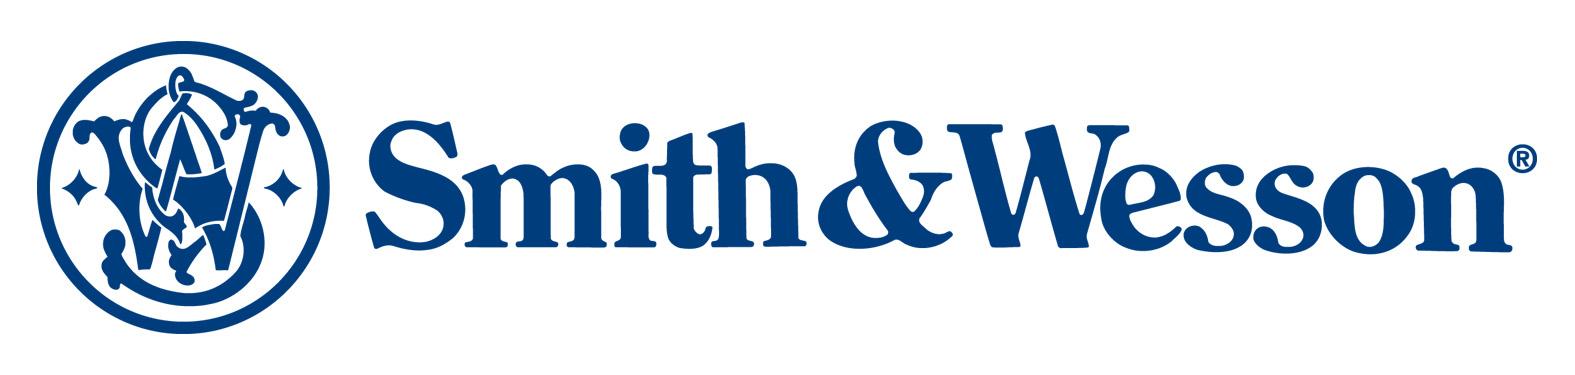 Smith_Wesson-Logo